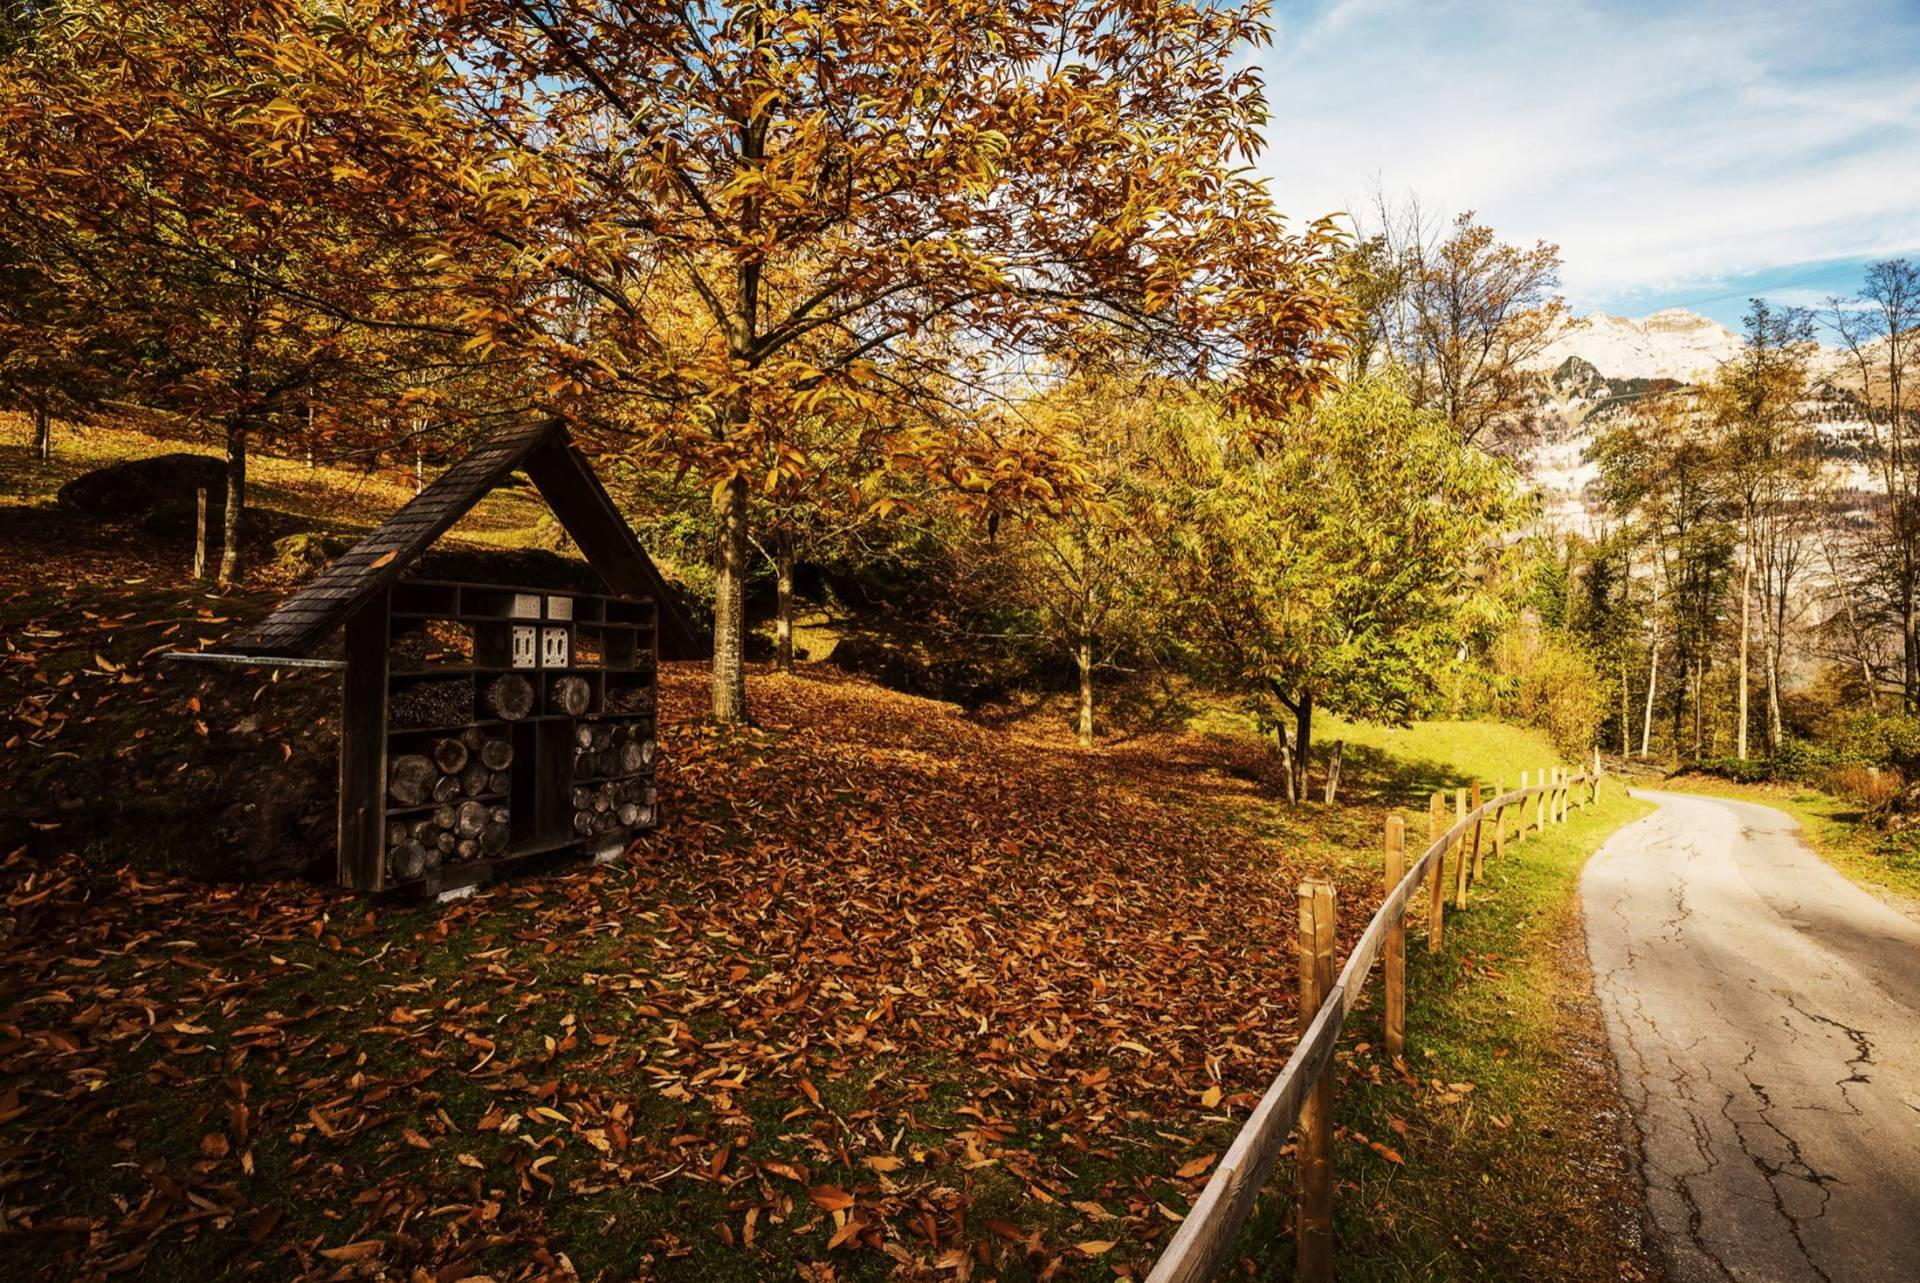 Kastanienwald in Murg / S4